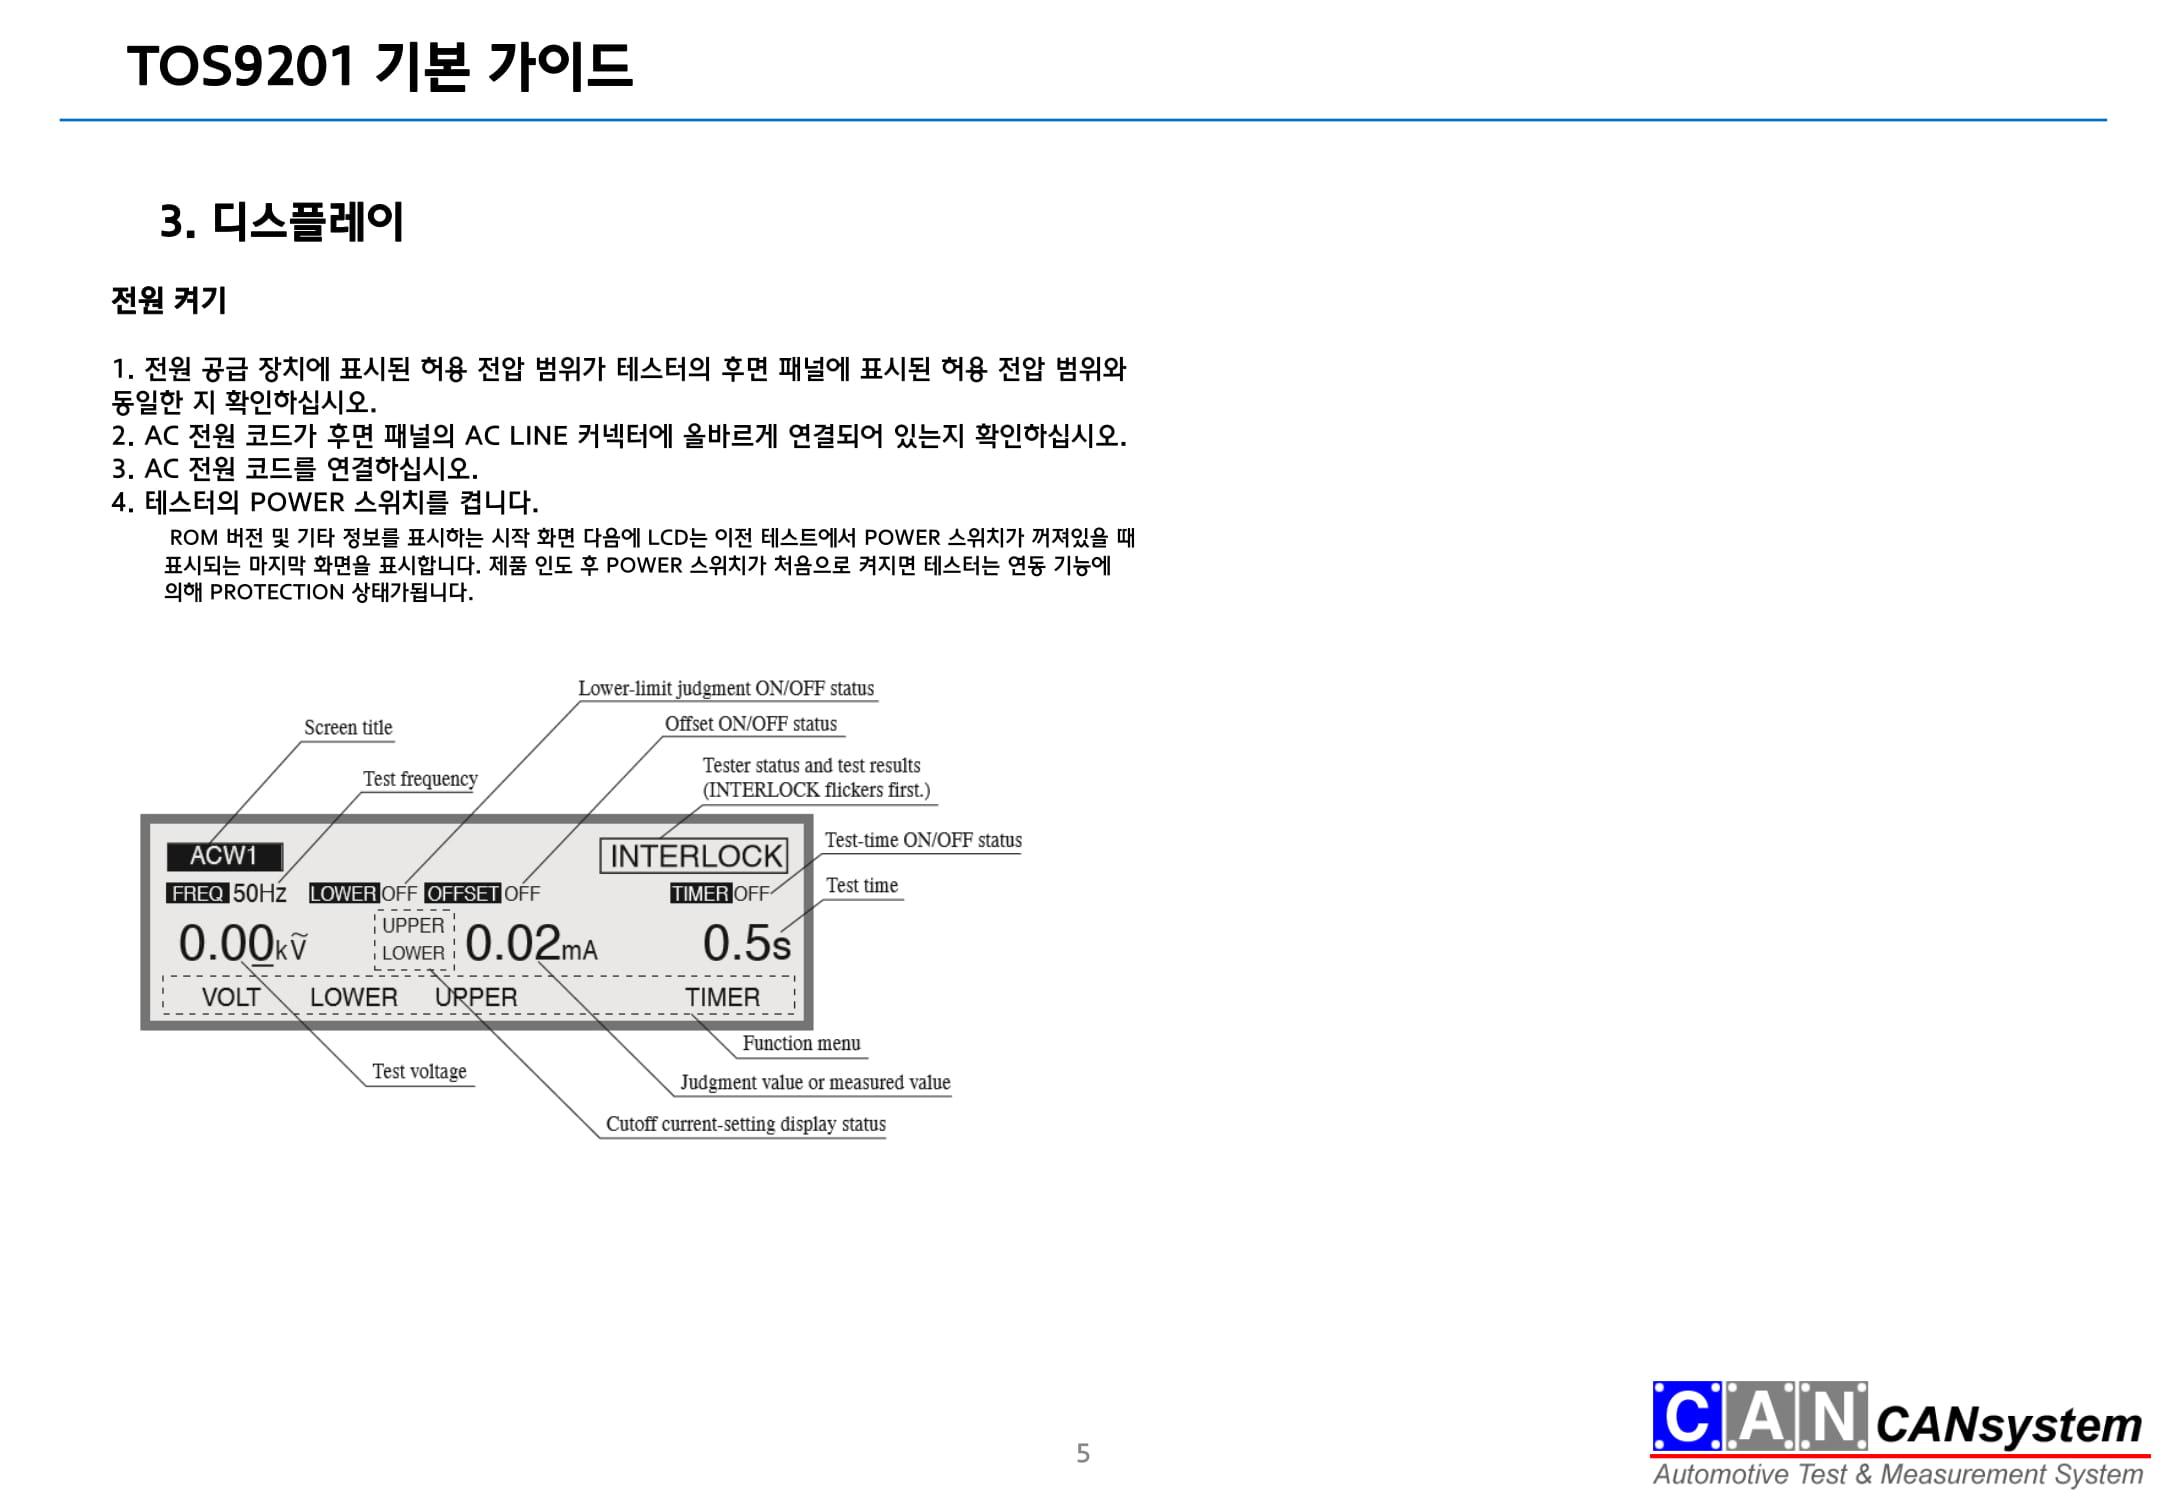 KIKUSUI TOS9201 국문 이용가이드-05.jpg